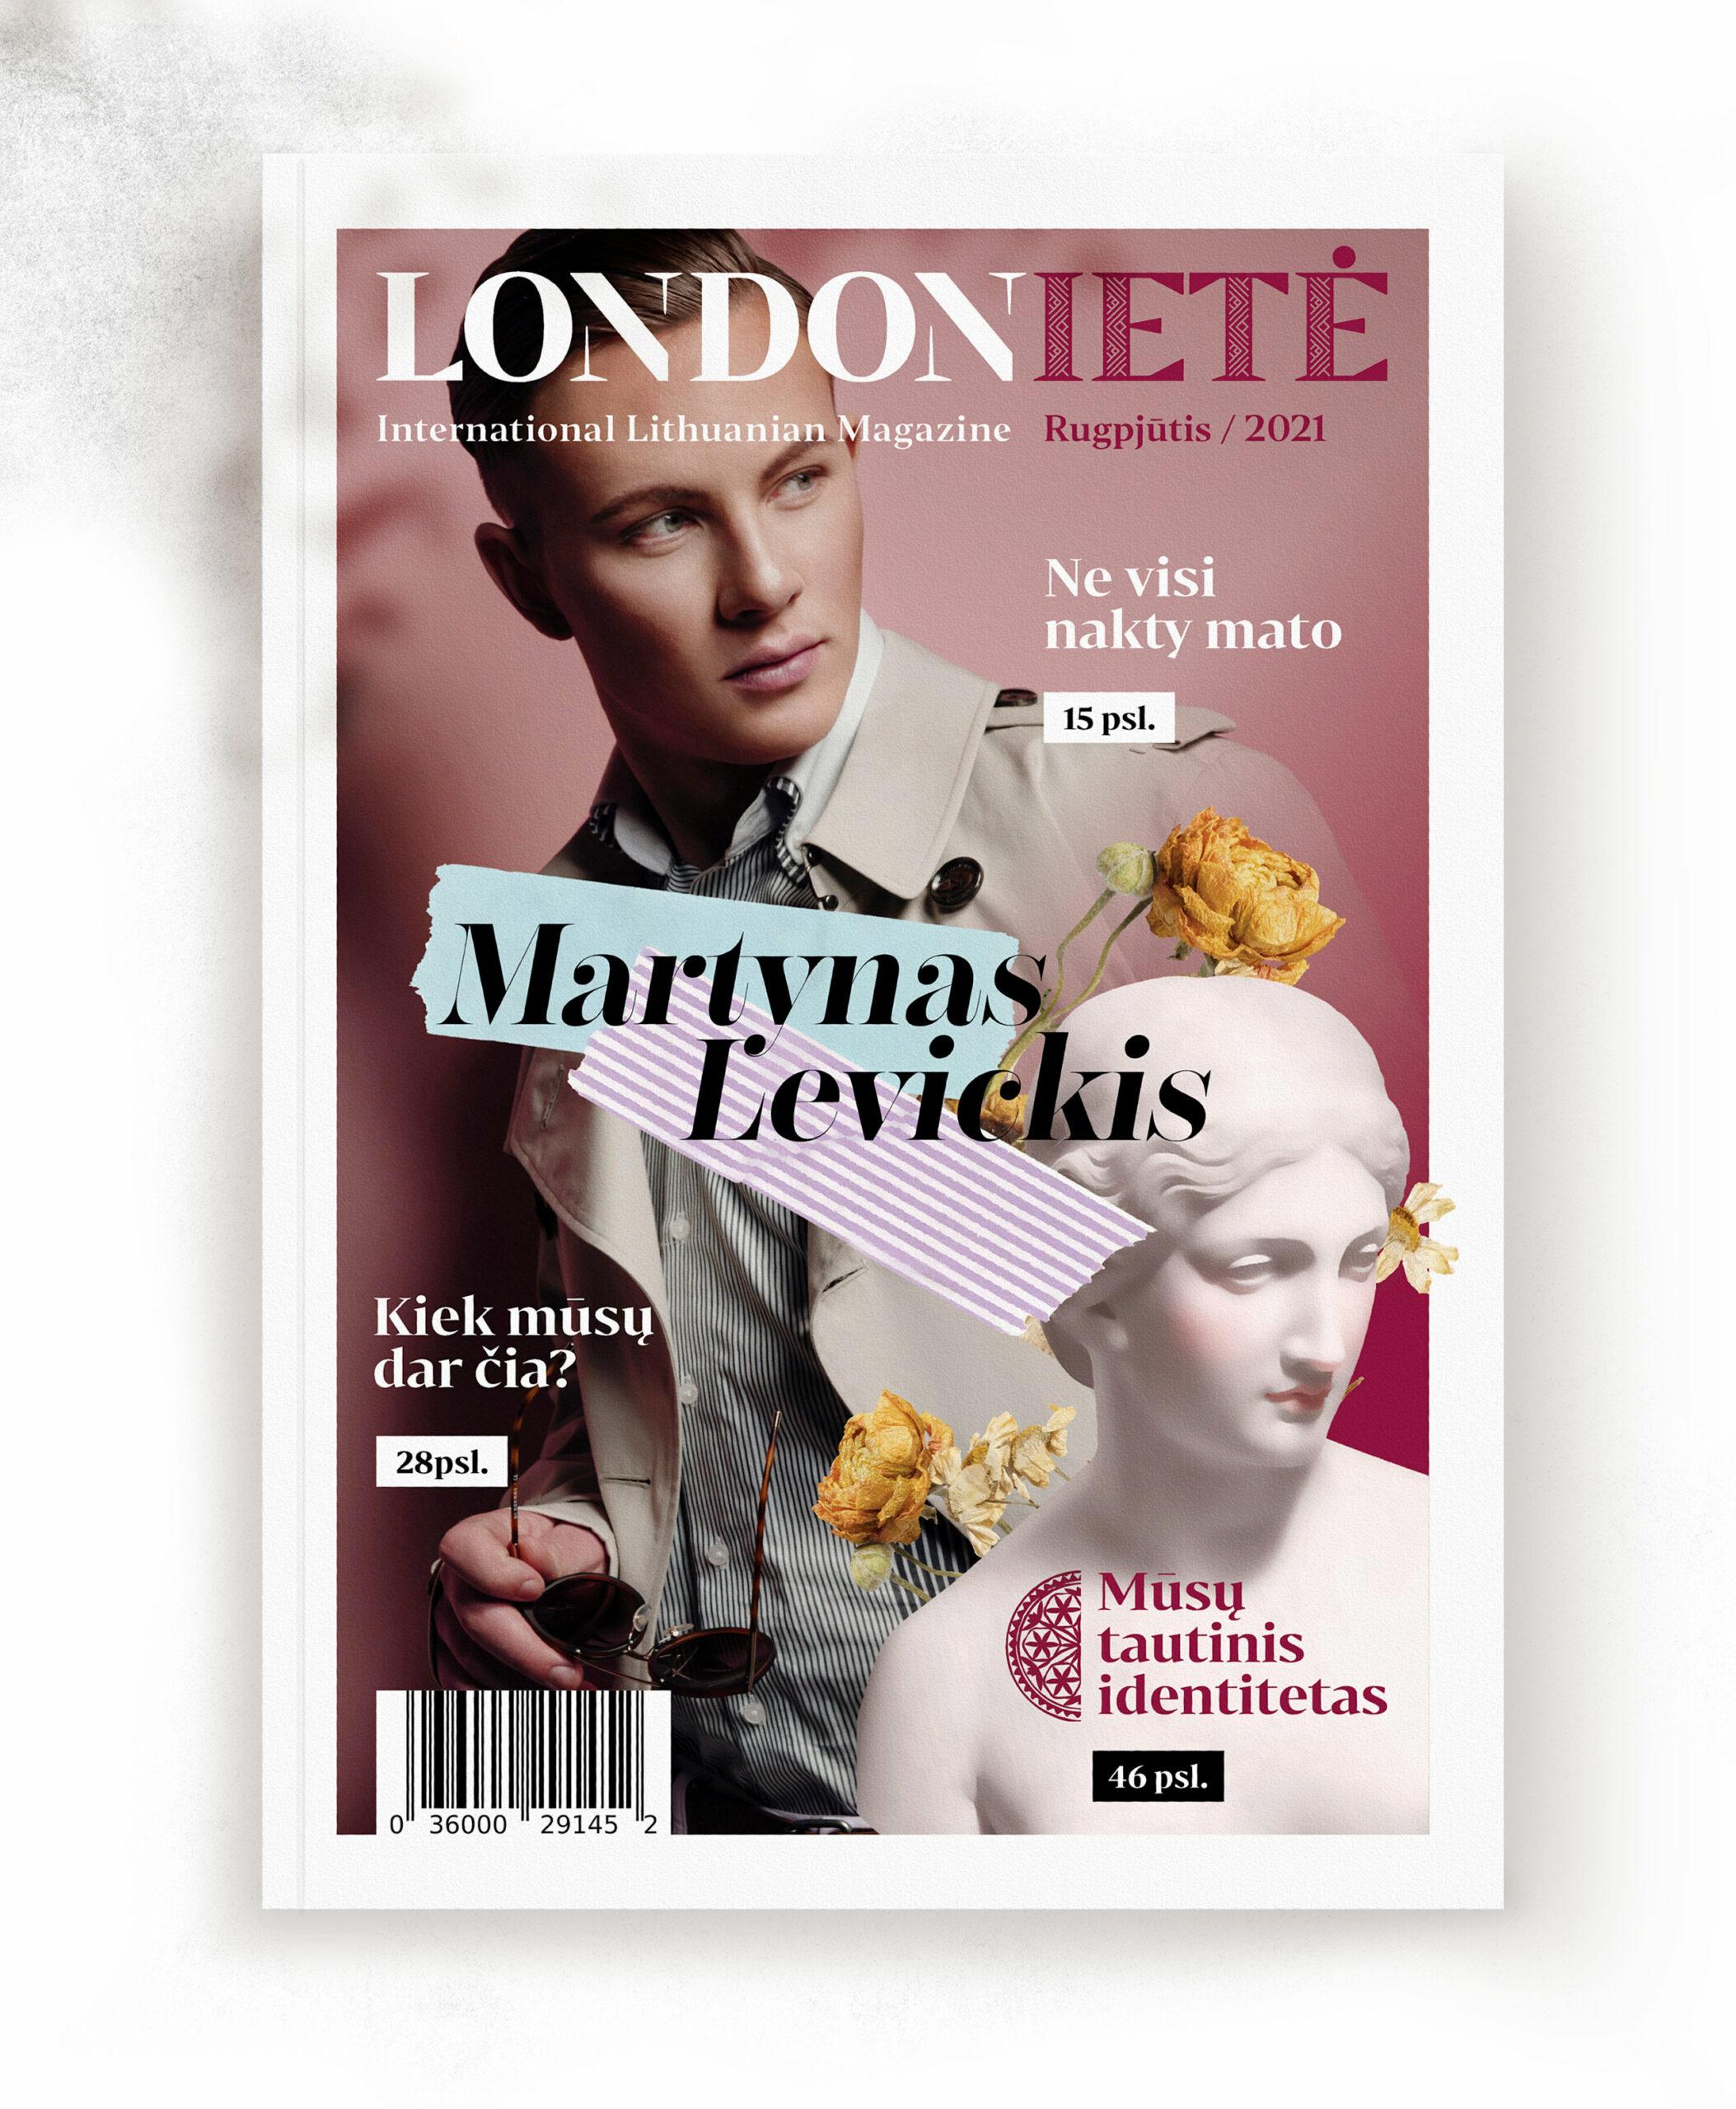 Londoniete-cover----Logobou-design